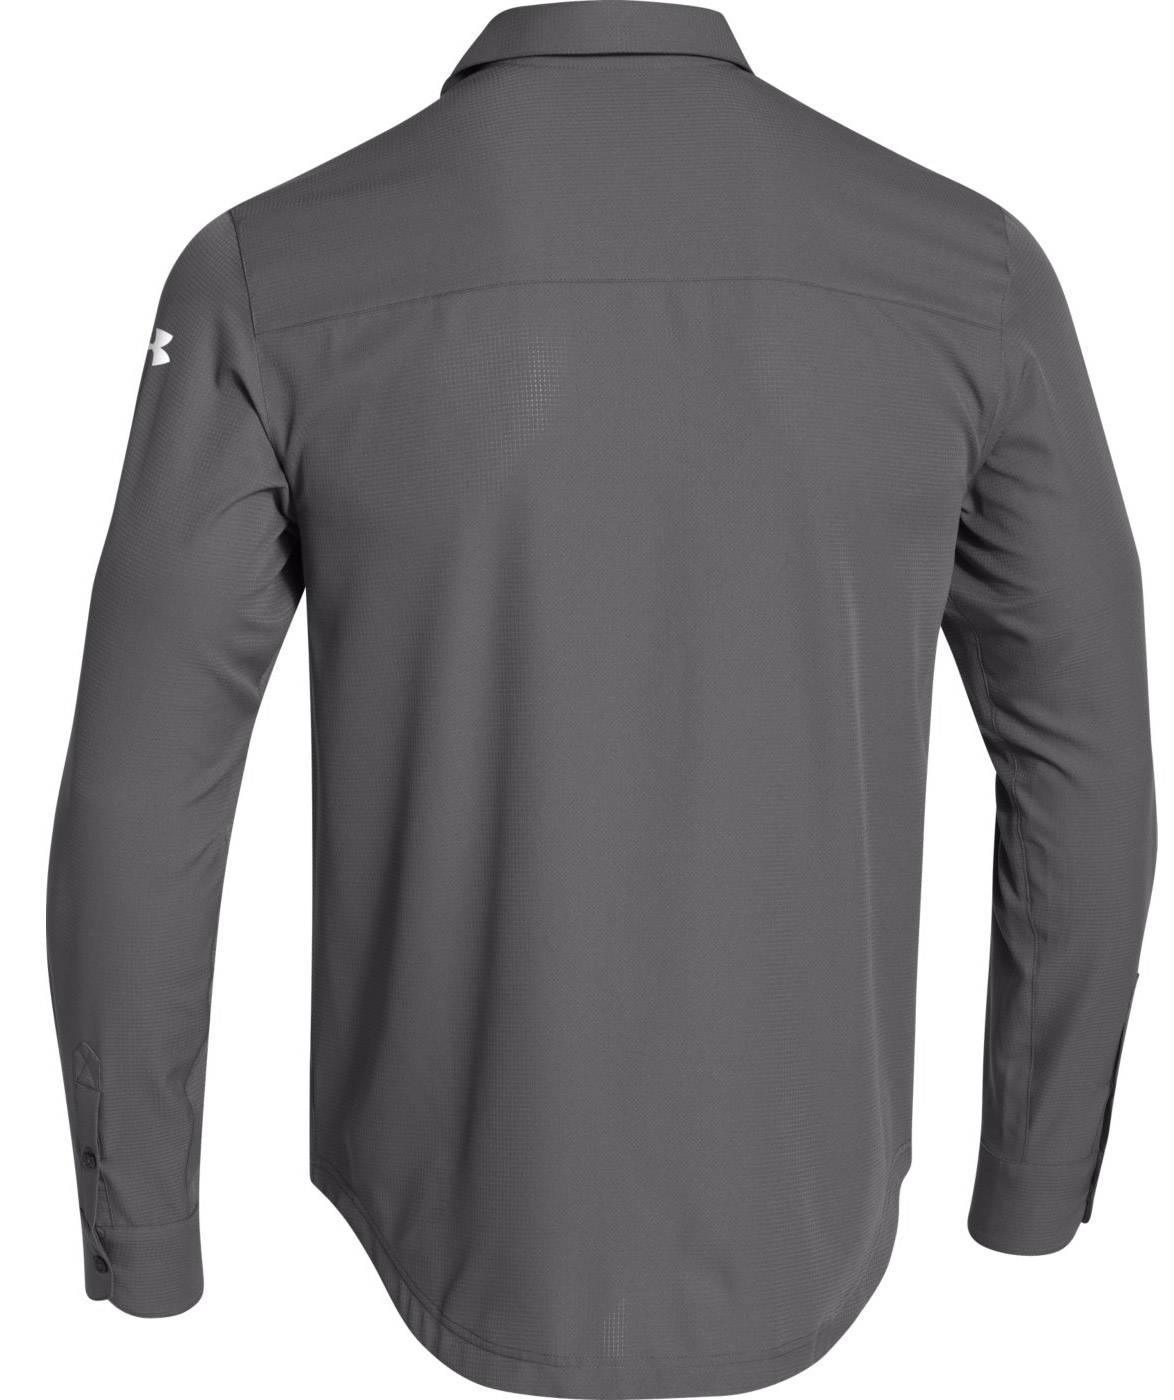 88205f5af Custom Under Armour T Shirts - BCD Tofu House